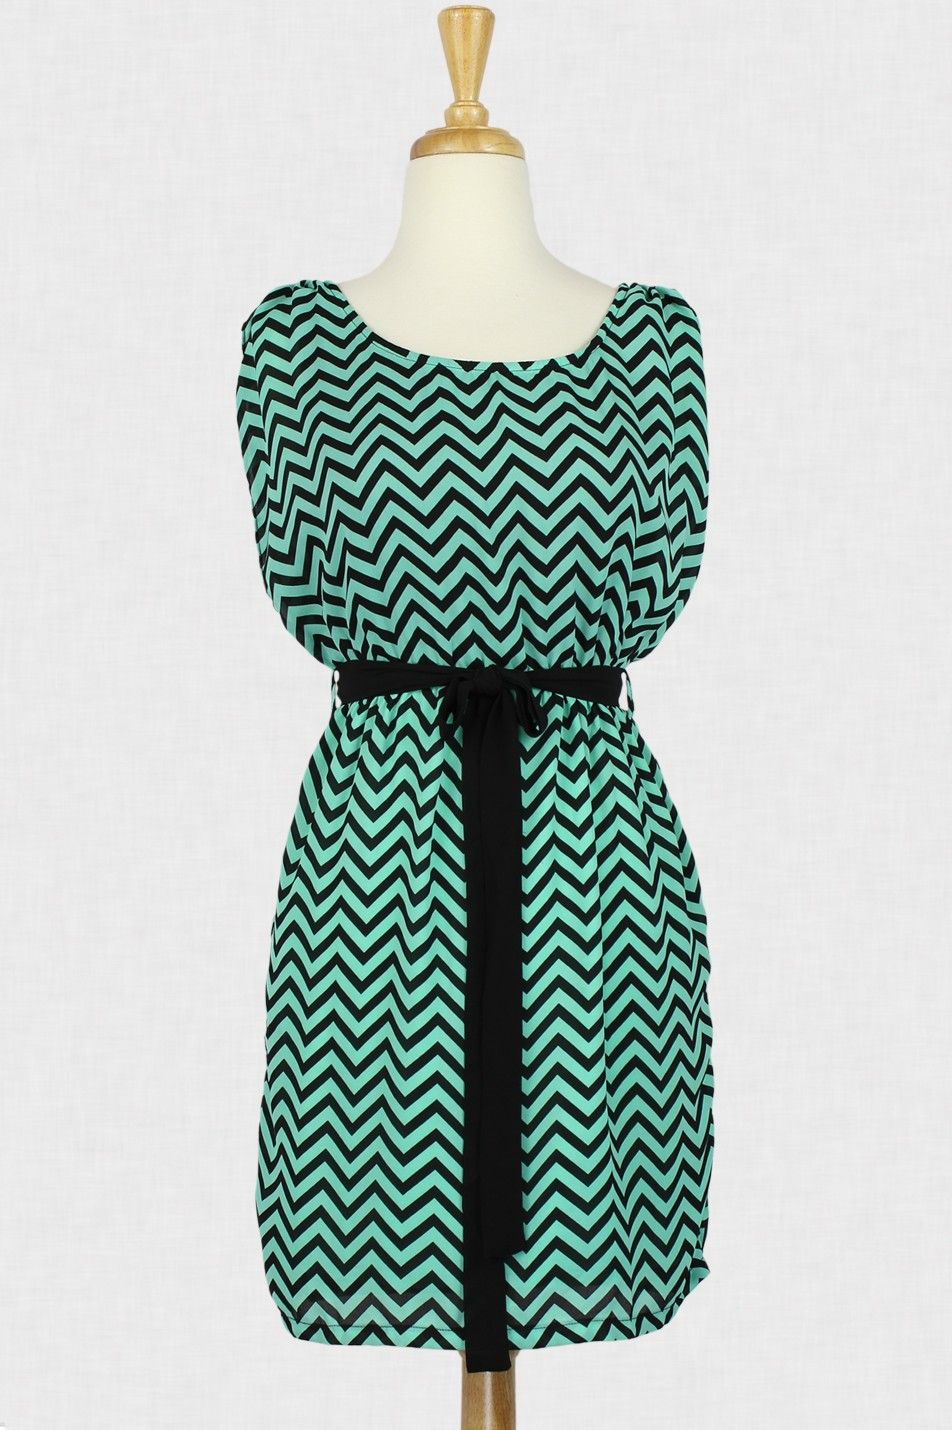 Fantastic Chevron Party Dress Inspiration - All Wedding Dresses ...